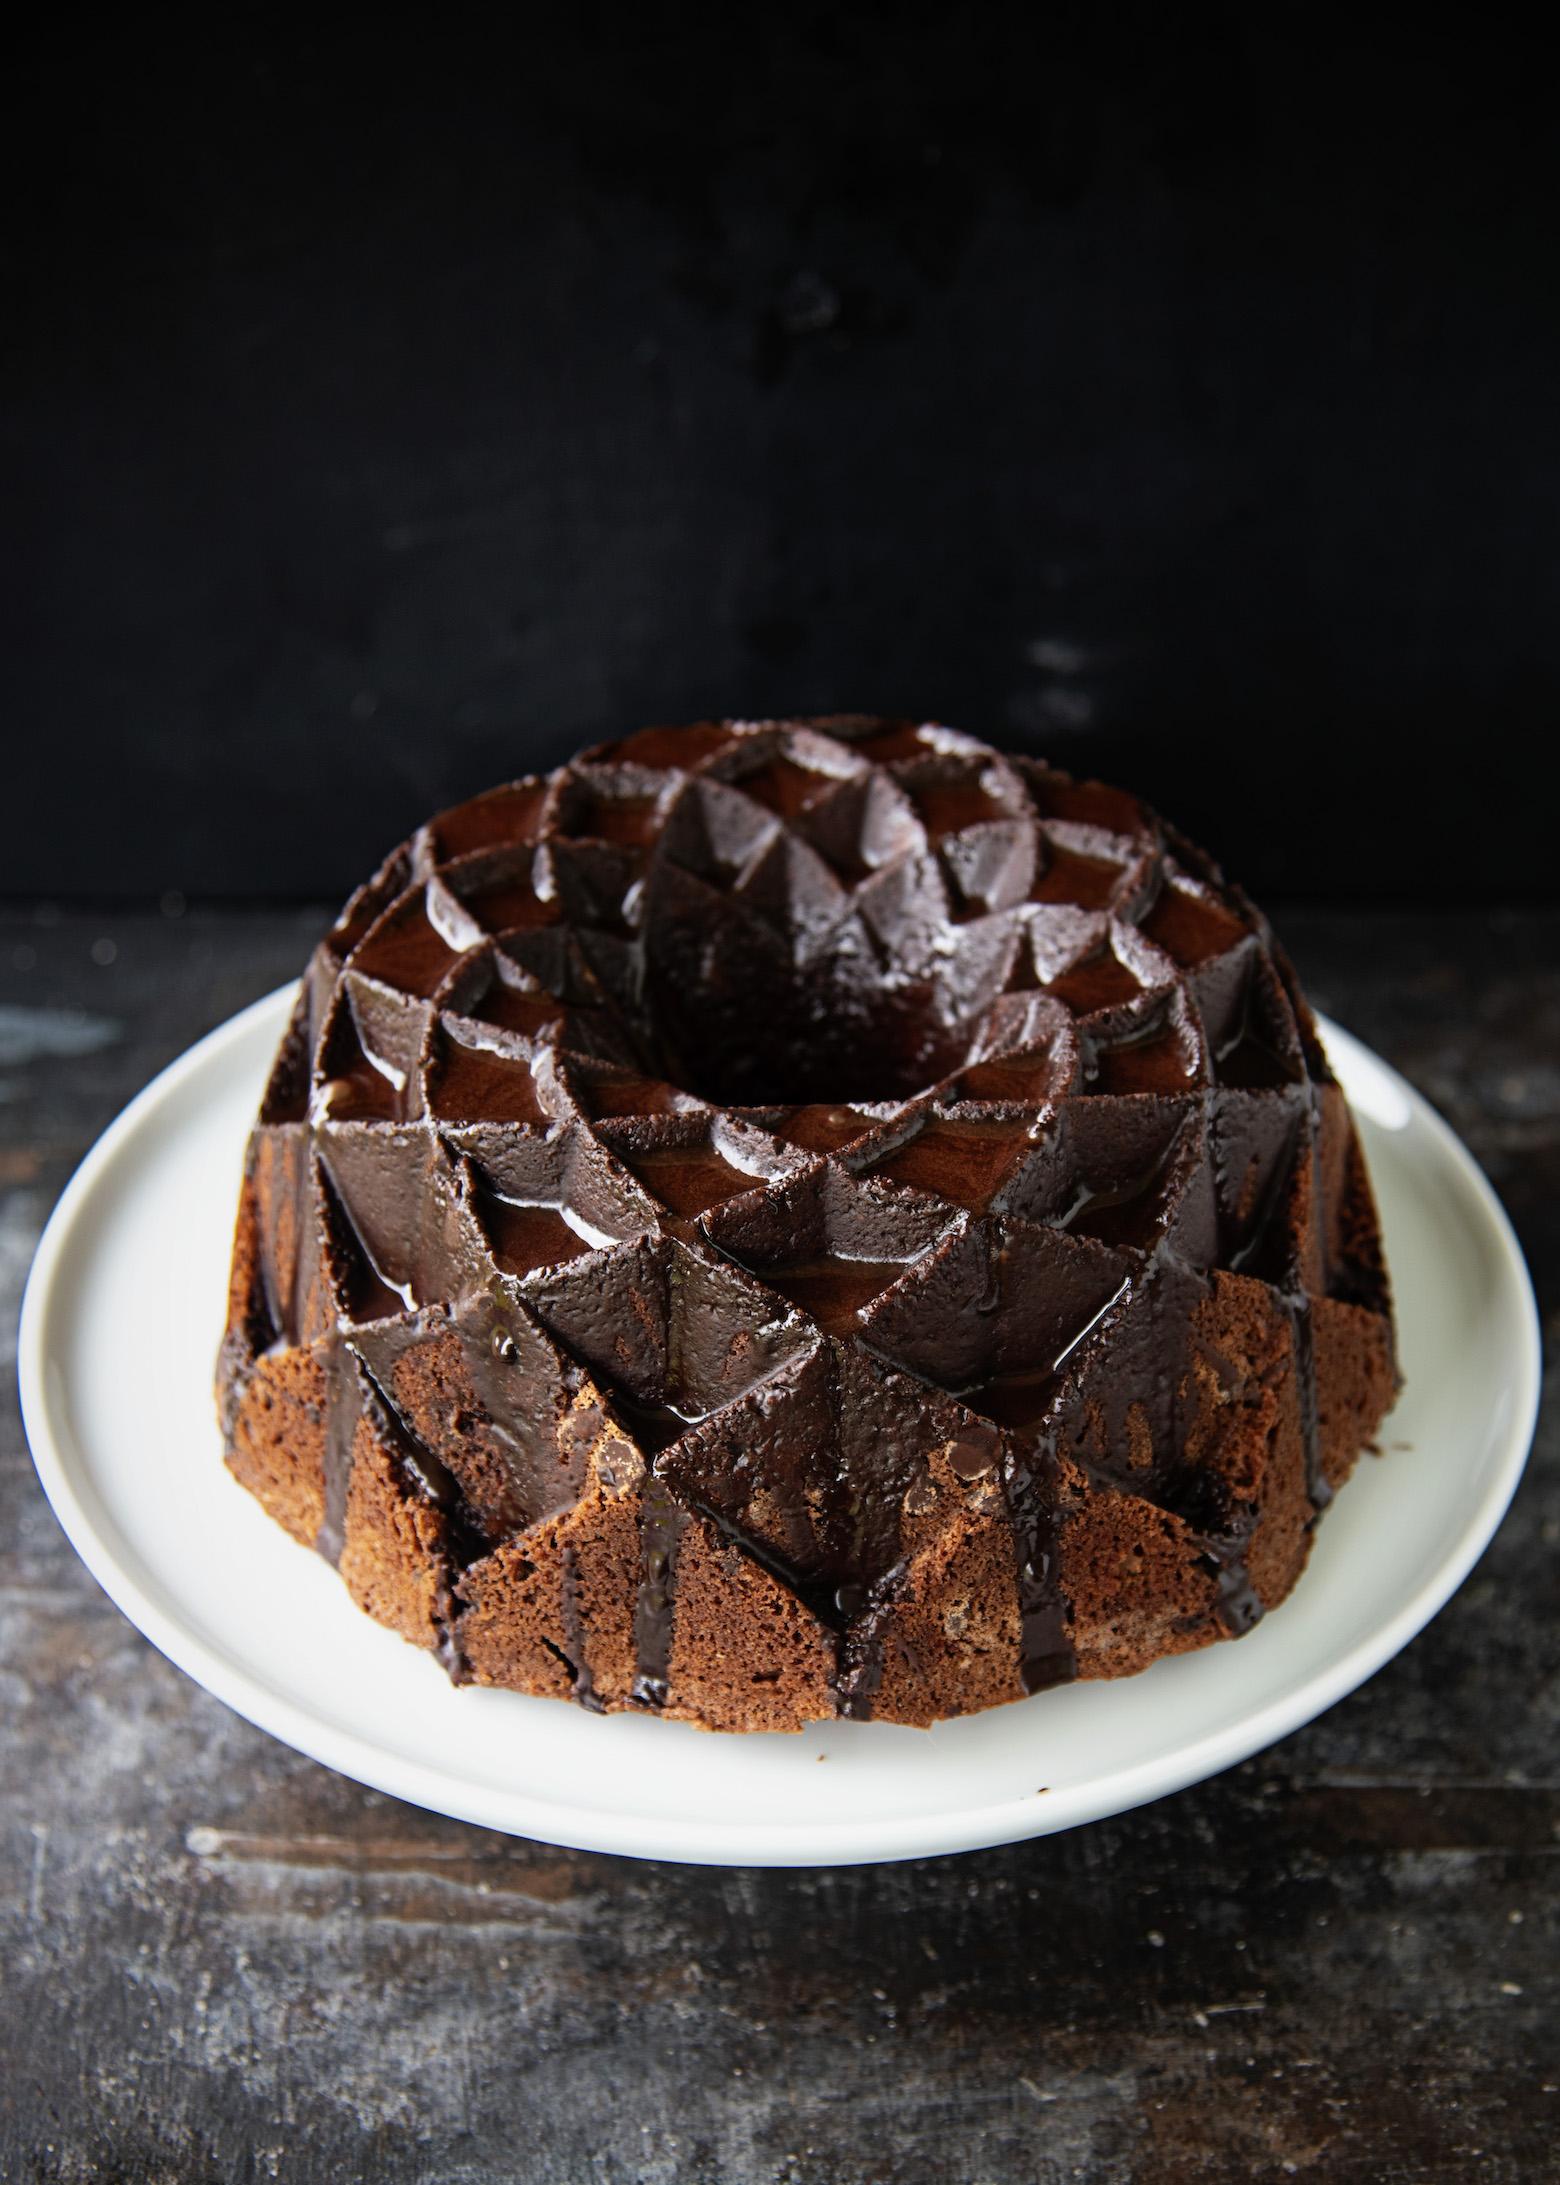 Bailey's Salted Caramel Chocolate Bundt Cake